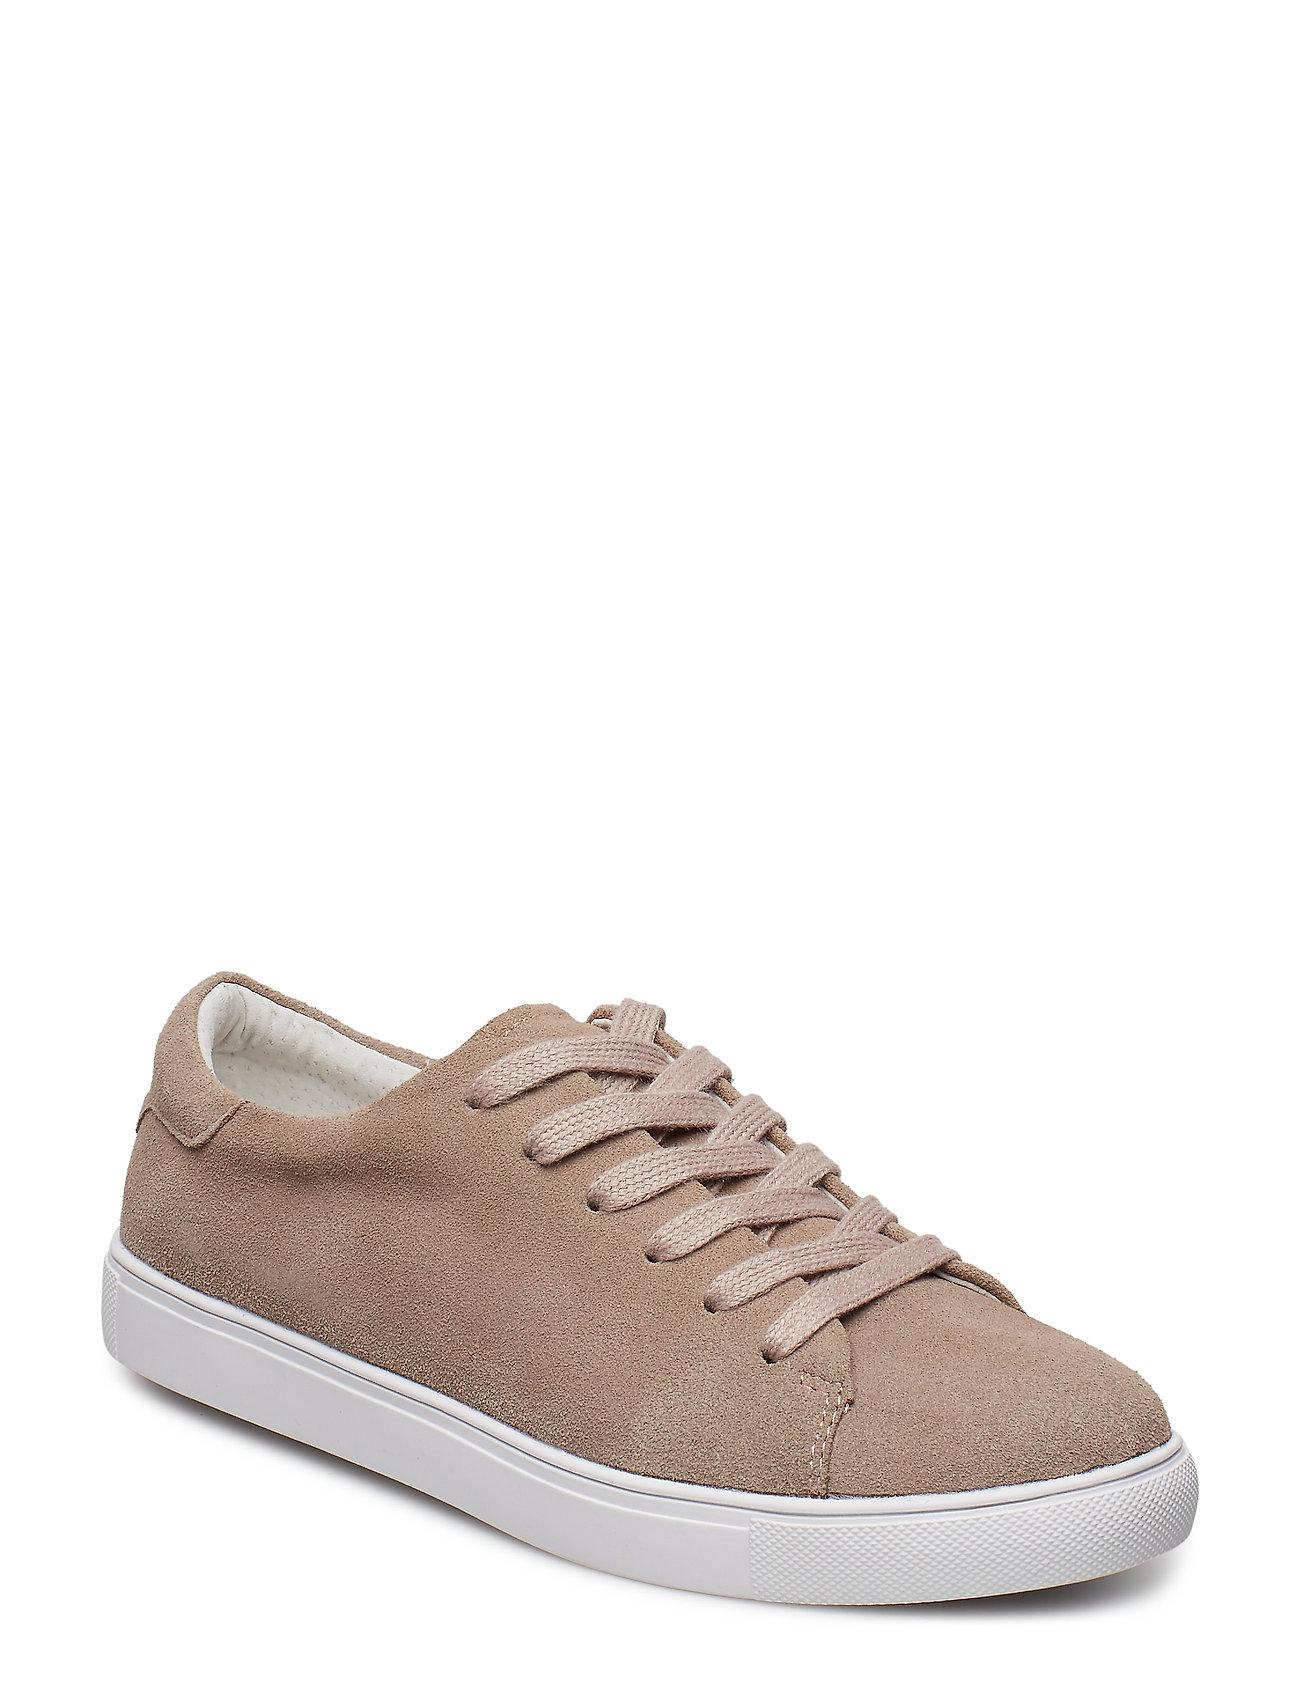 a22bcf36e578d0 Shoe The Bear Ella S (Light Pink)